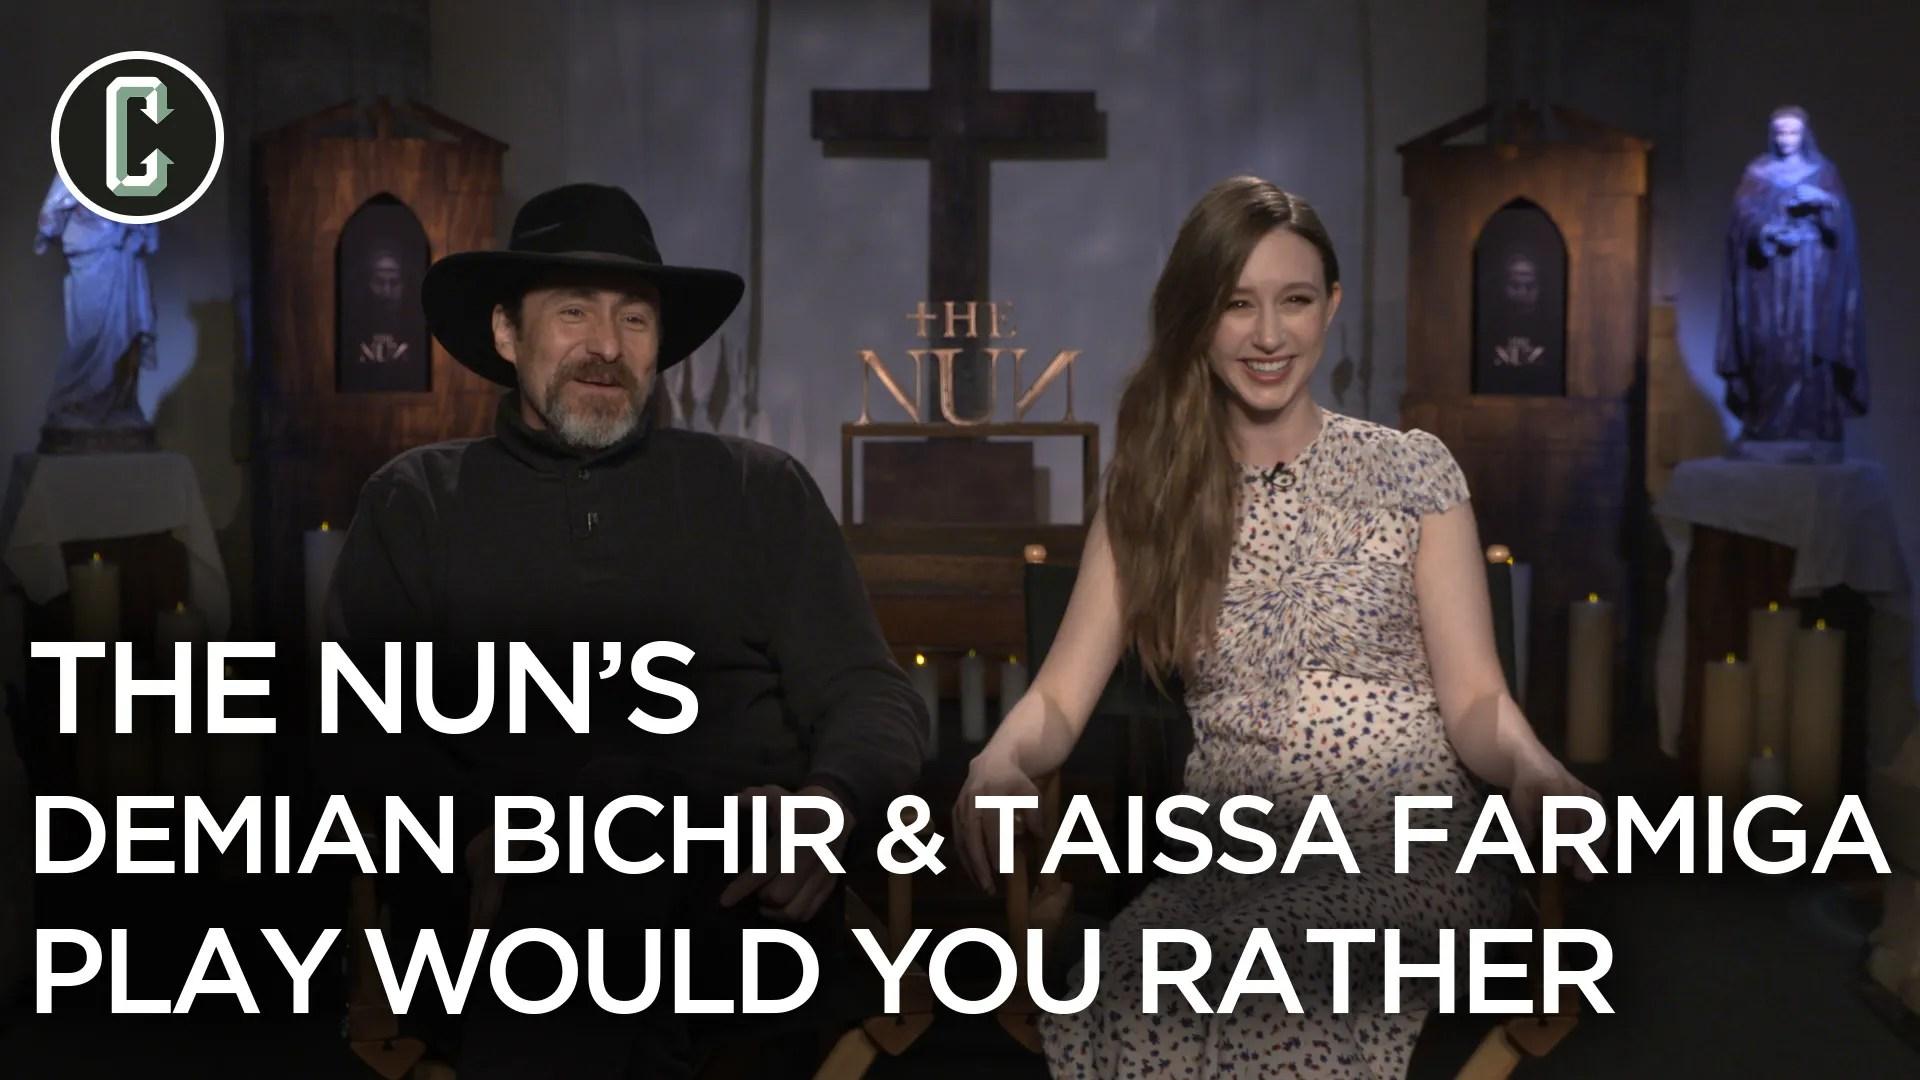 The Nuns Demian Bichir Amp Taissa Farmiga Play Would You